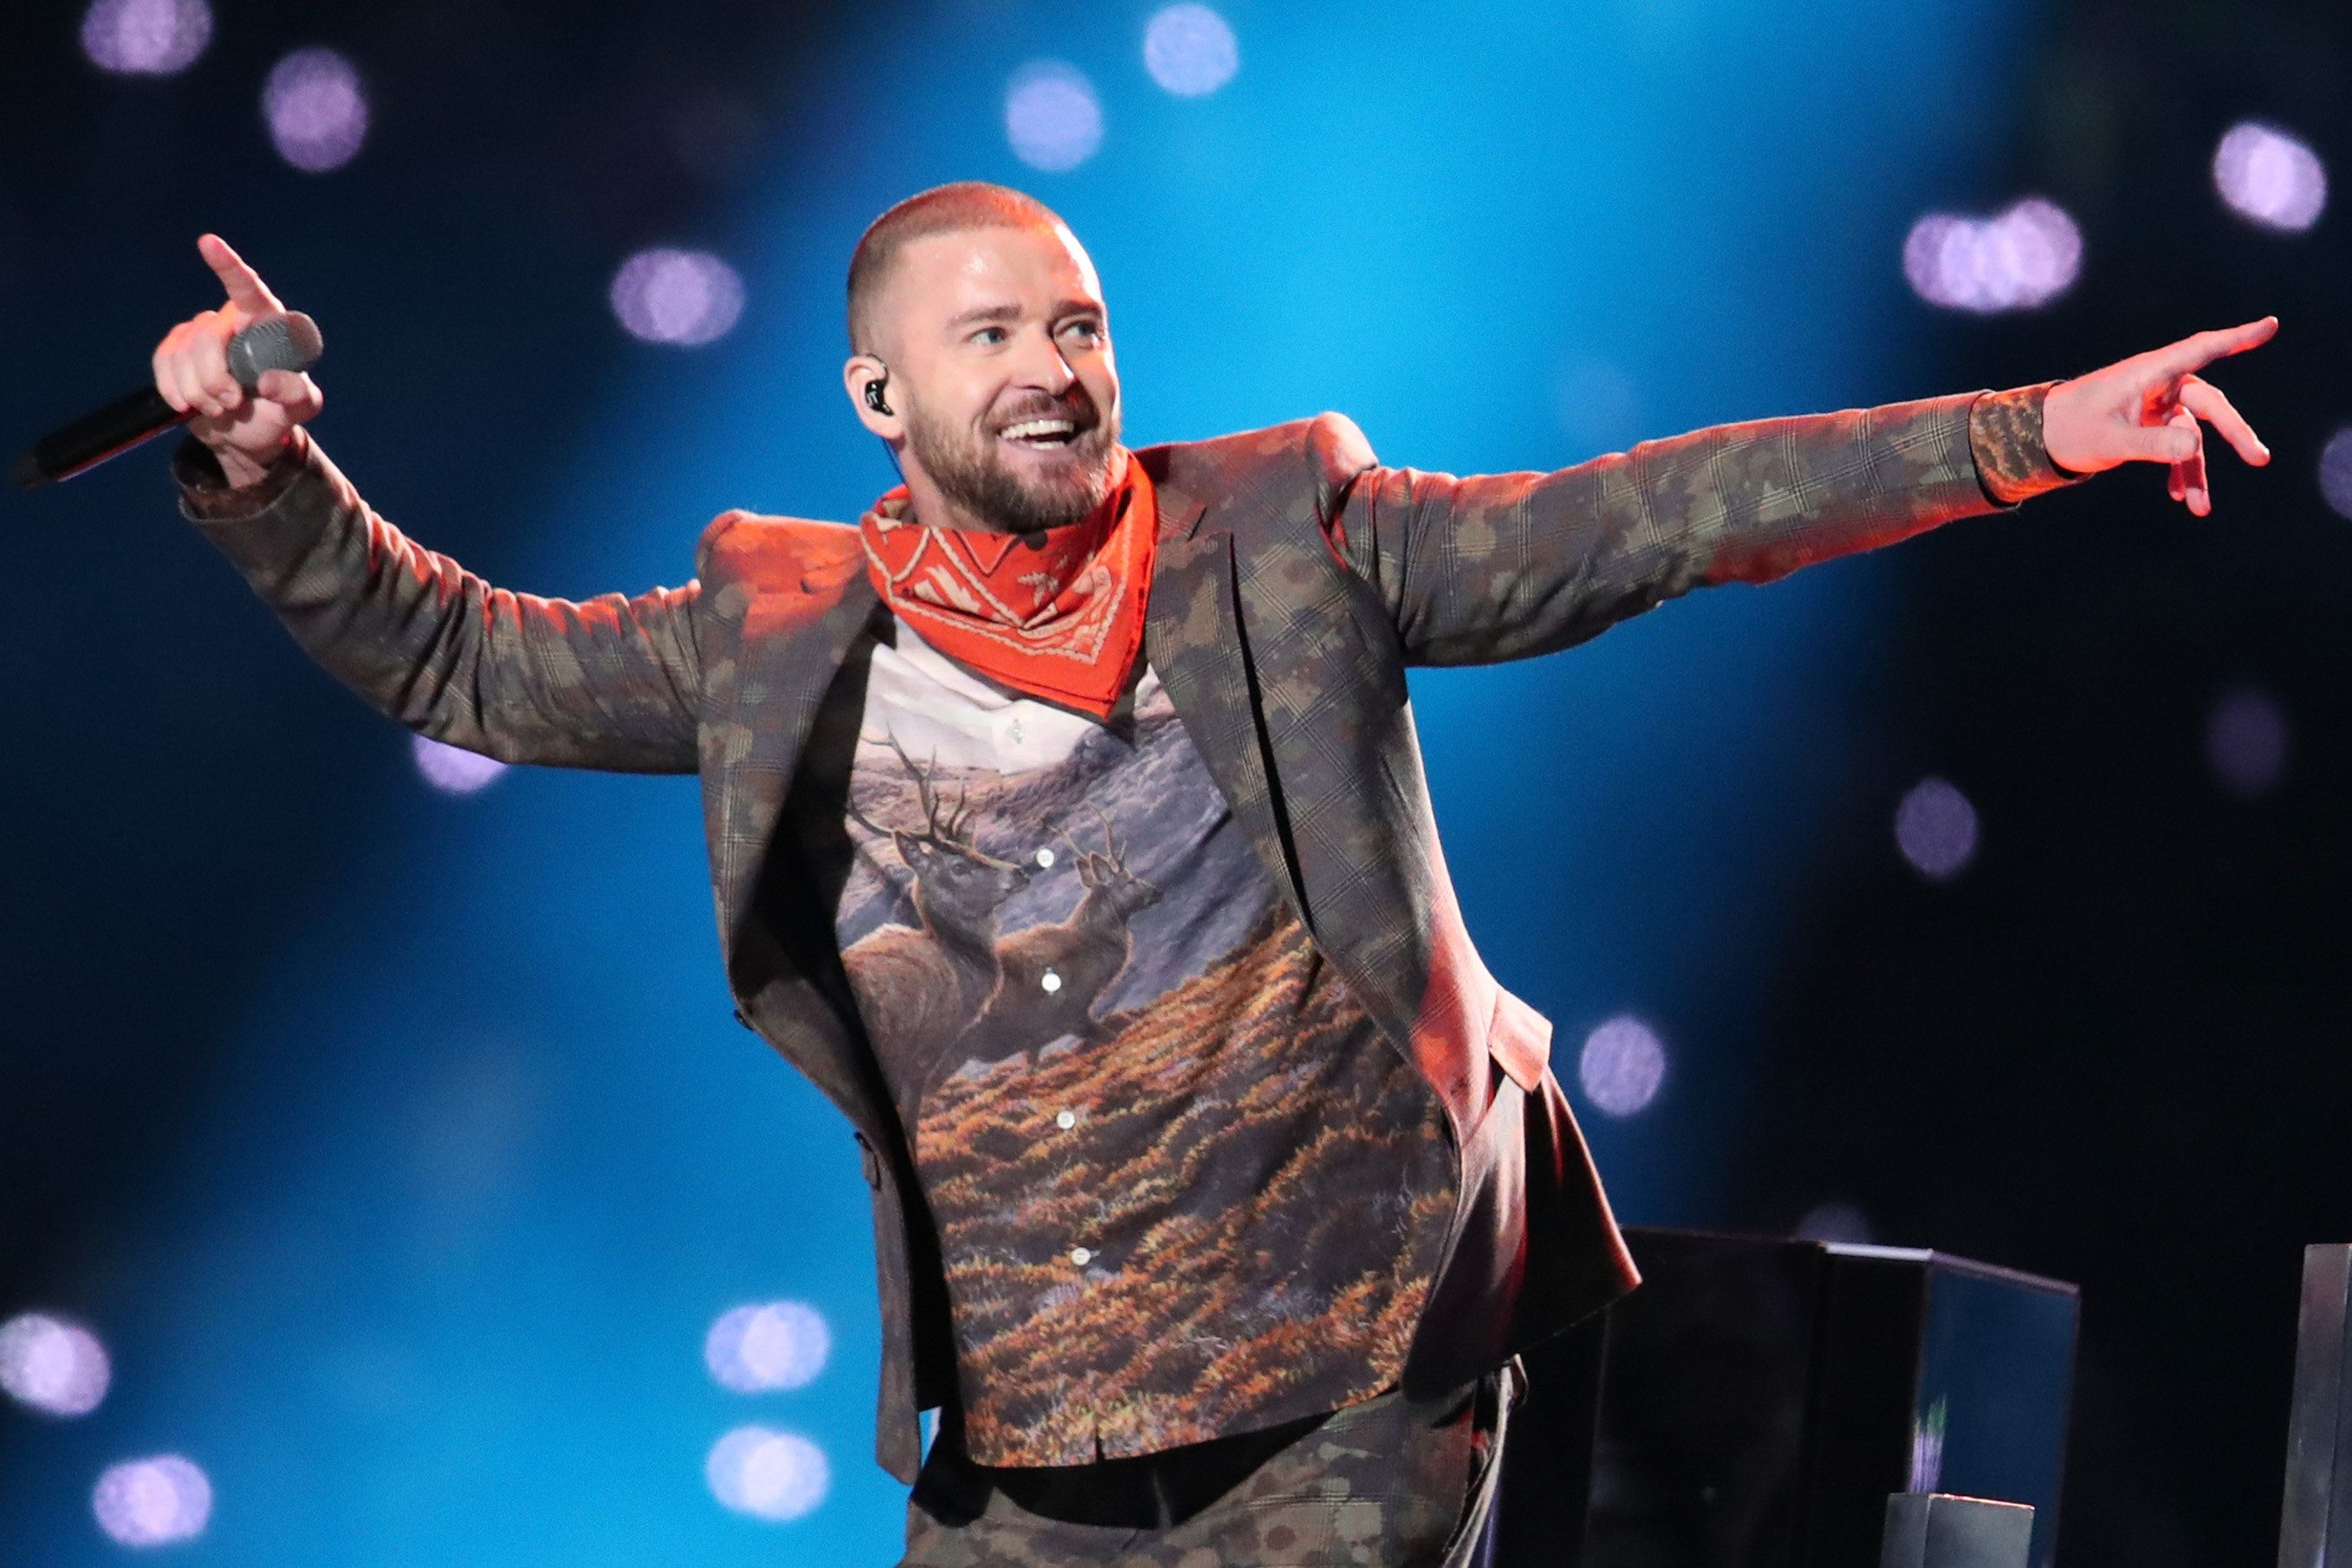 Justin Timberlake announces a concert stop in Kansas City